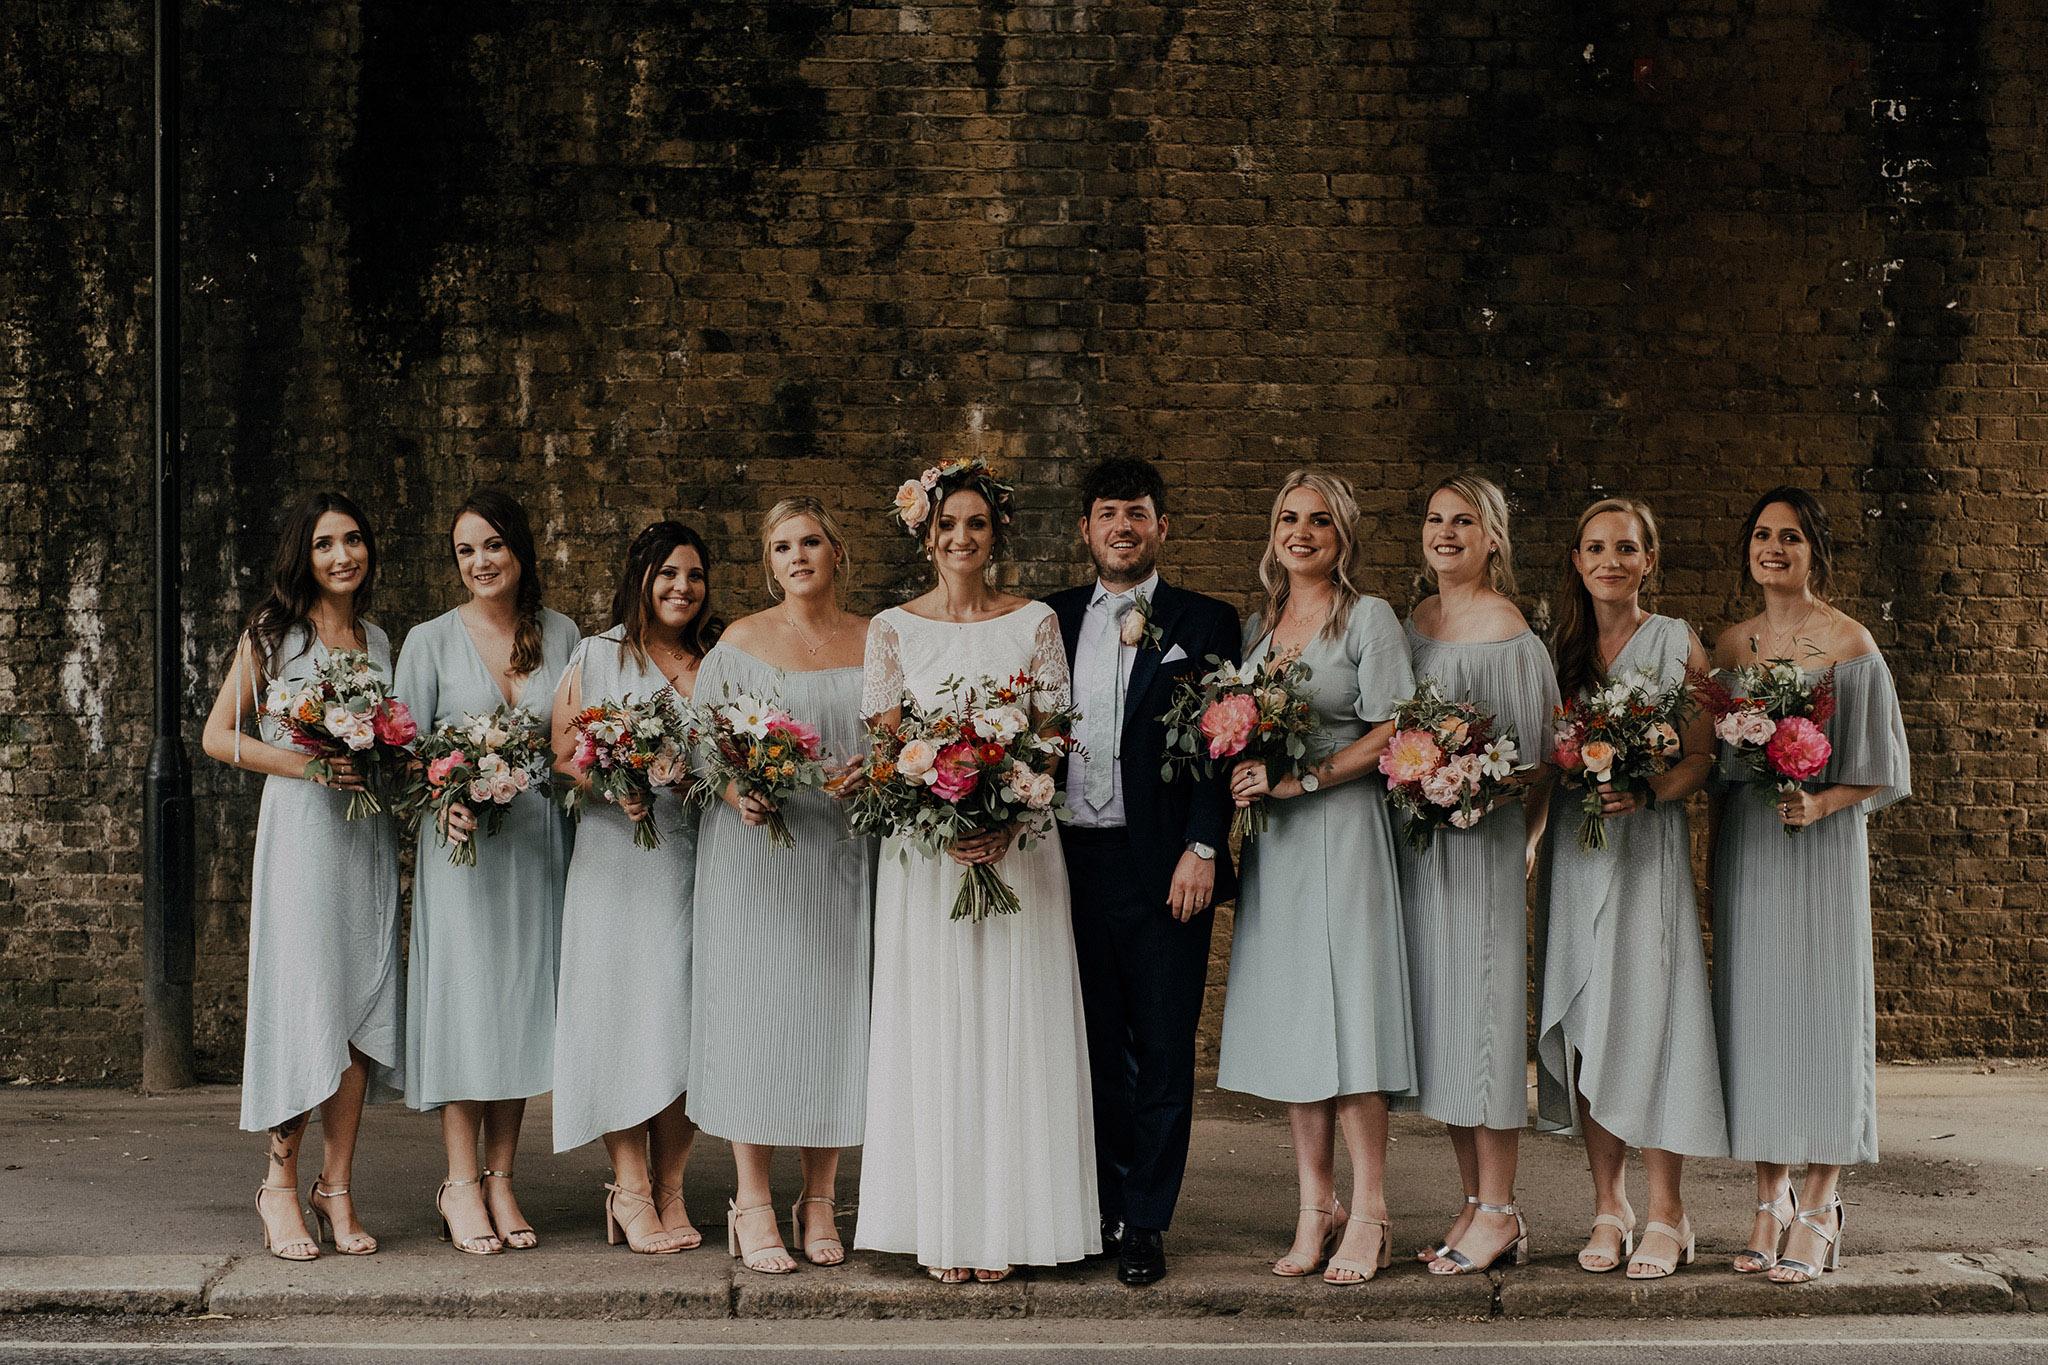 Islington-town-hall-wedding62.jpg